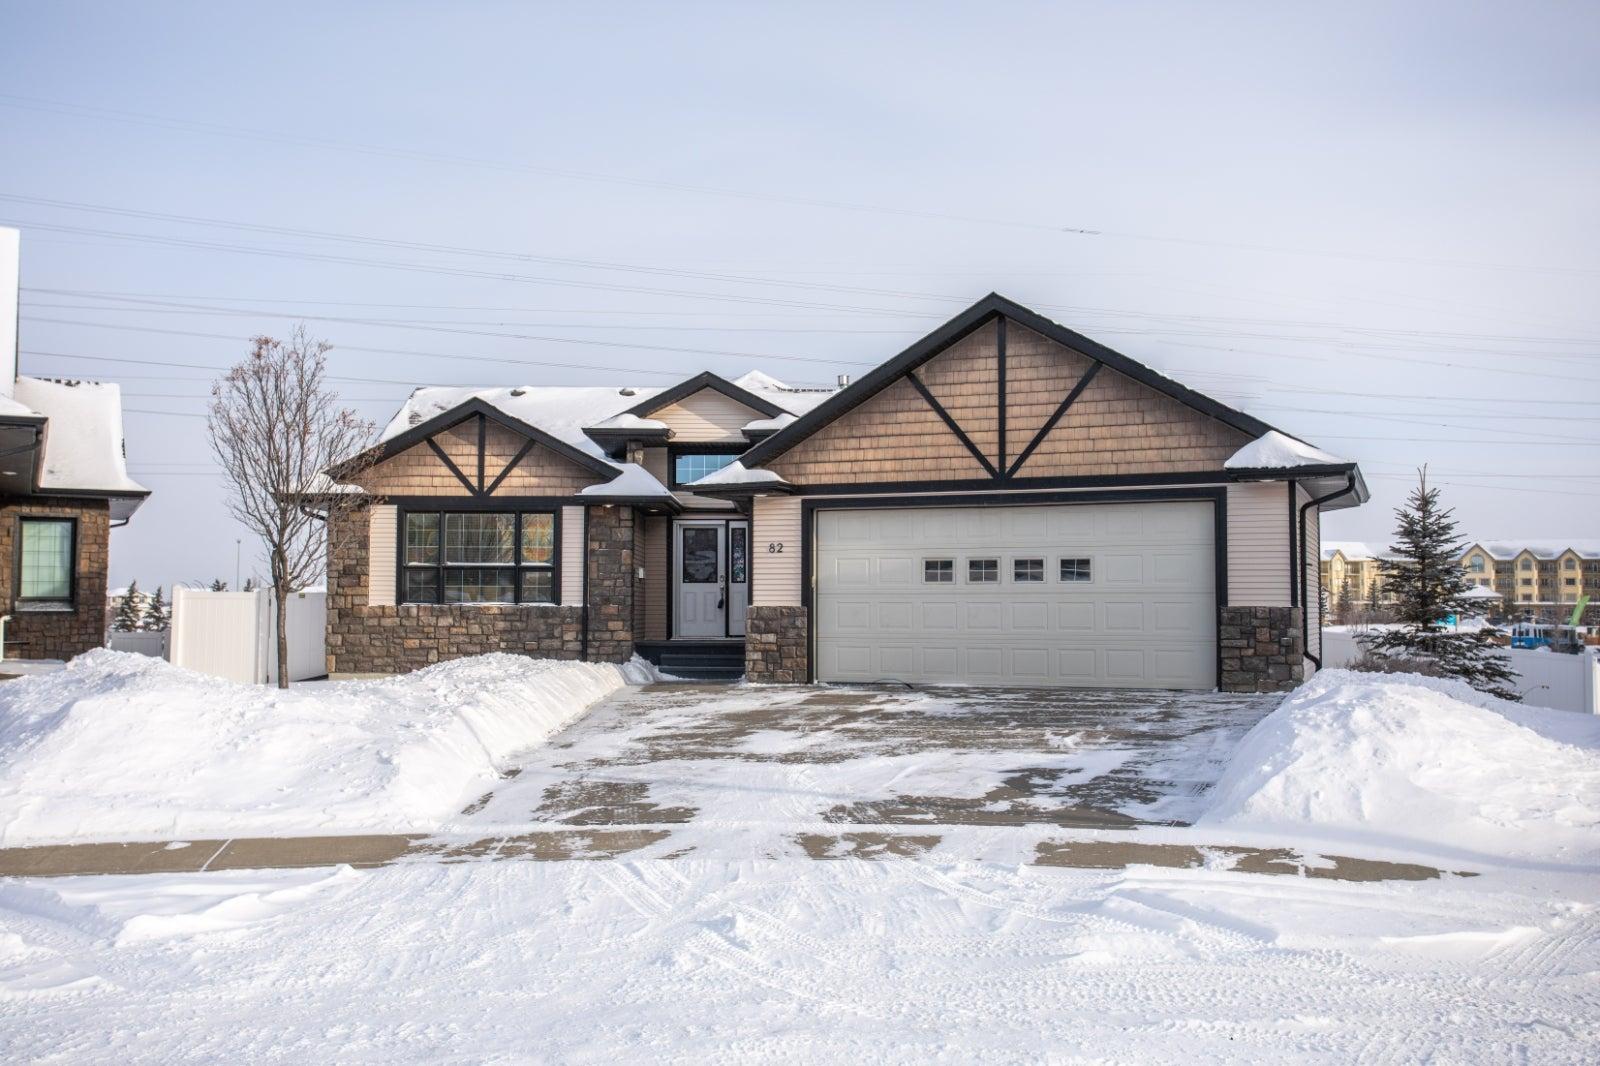 82 Ingram Close, Red Deer, AB T4R 0A3 - Inglewood Detached for sale(A1067183) #1